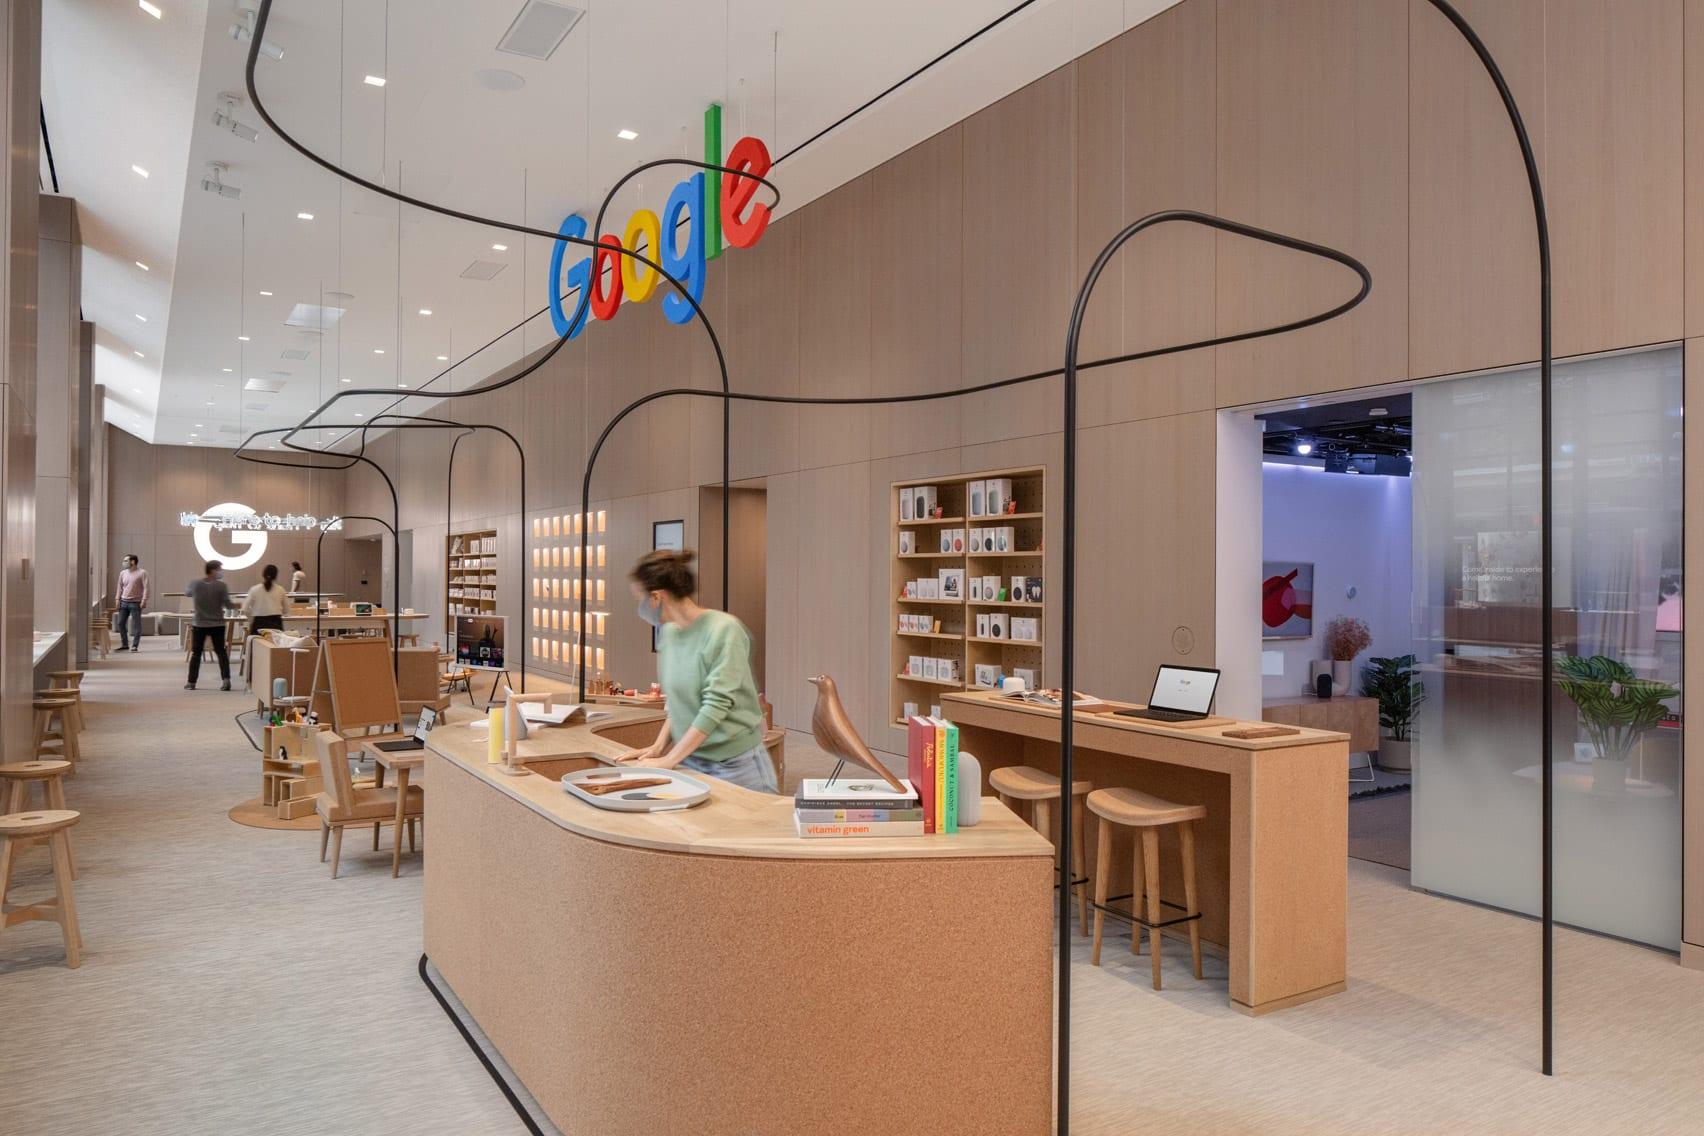 Google Store interior